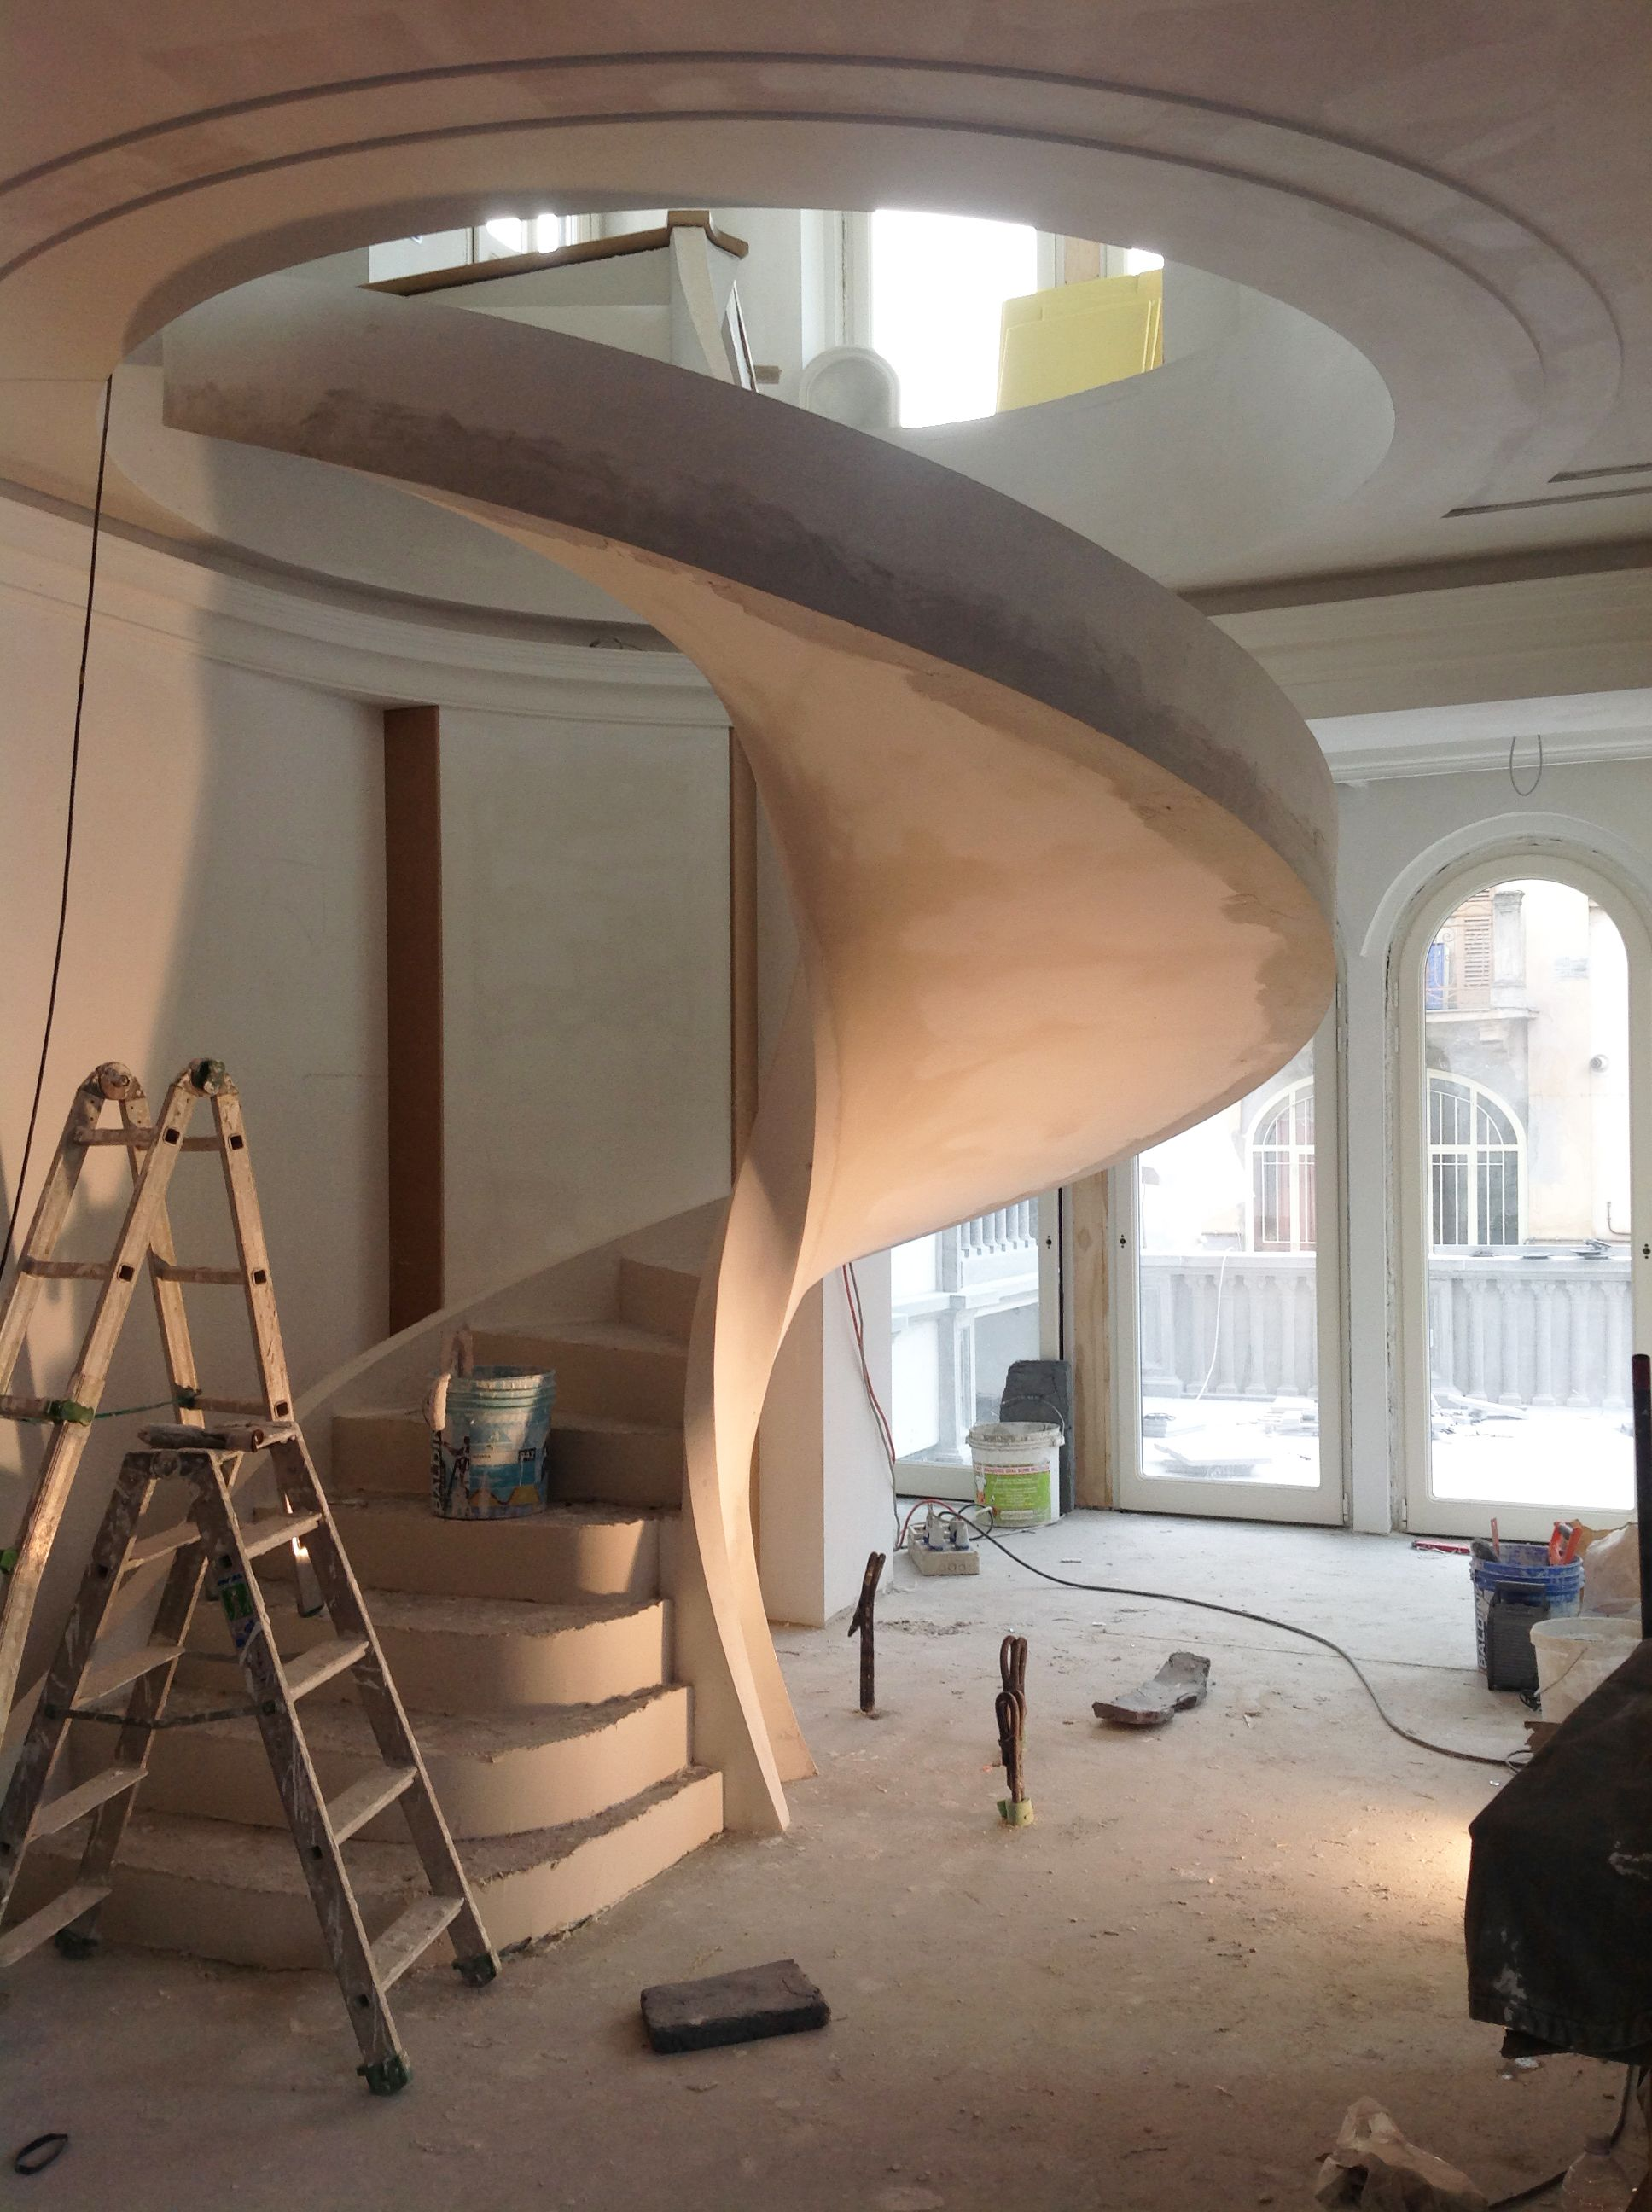 A winding armony.   #Stradivari #Design #architecture #stairs #workinprogress